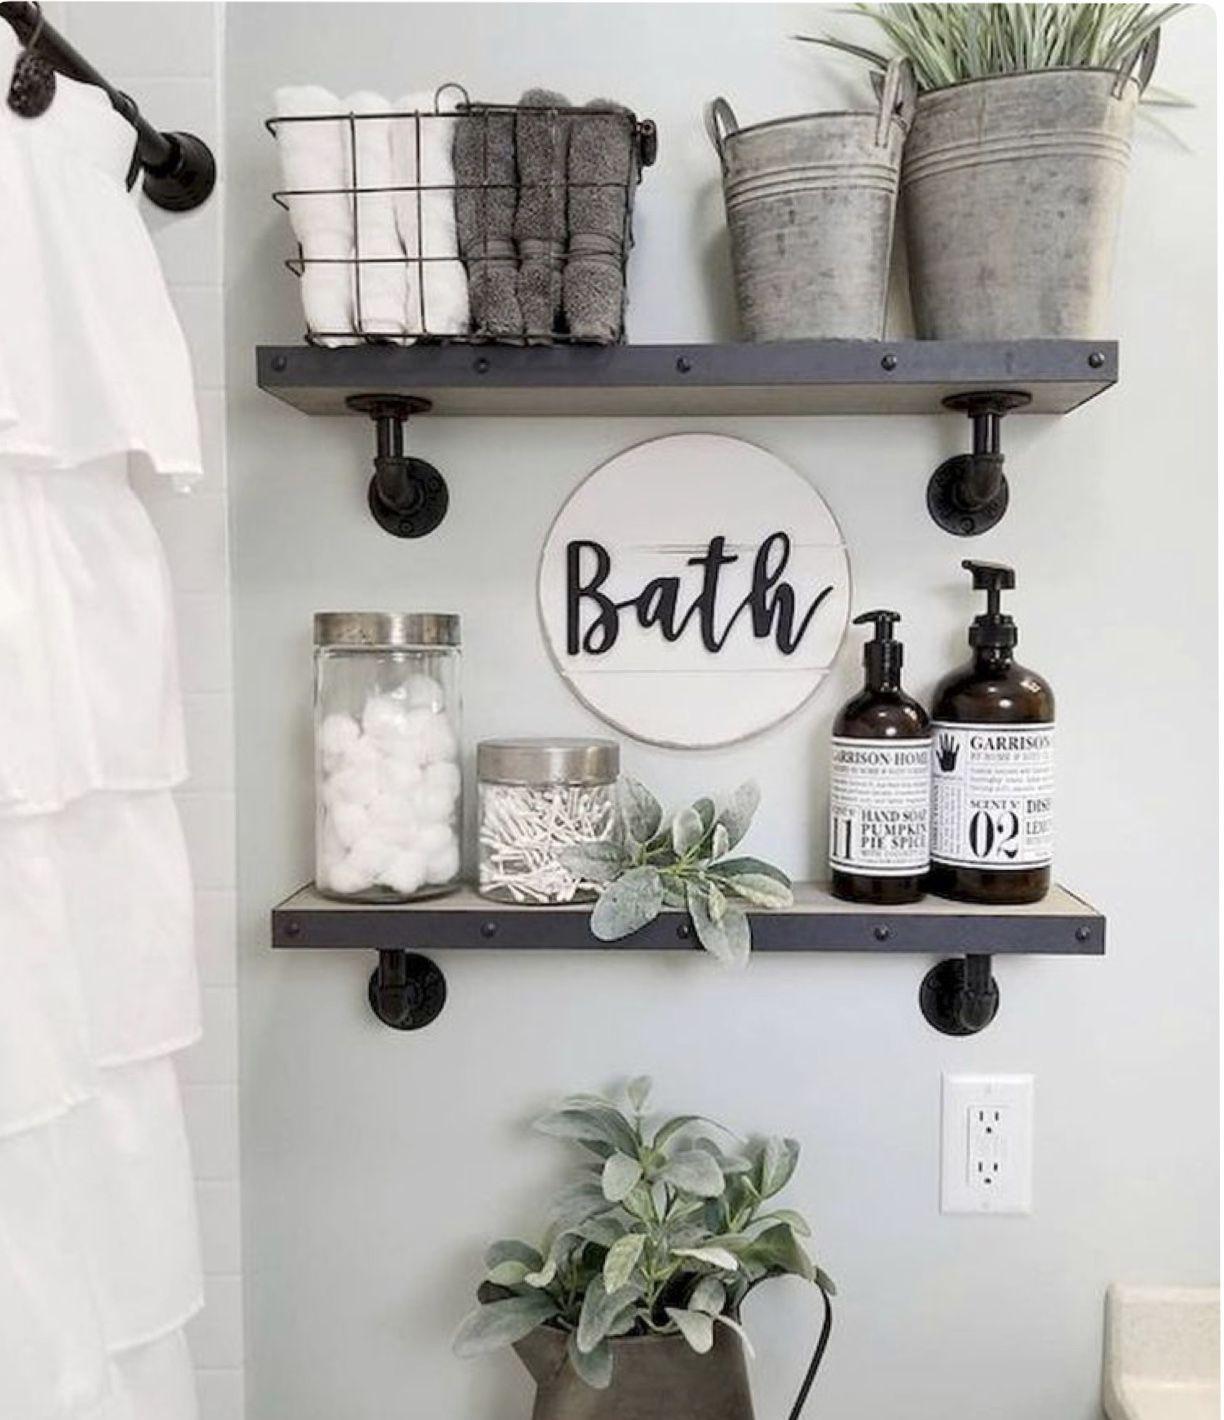 Photo of 7.25 Deep Rustic Floating Shelves Bathroom Storage Kitchen   Etsy